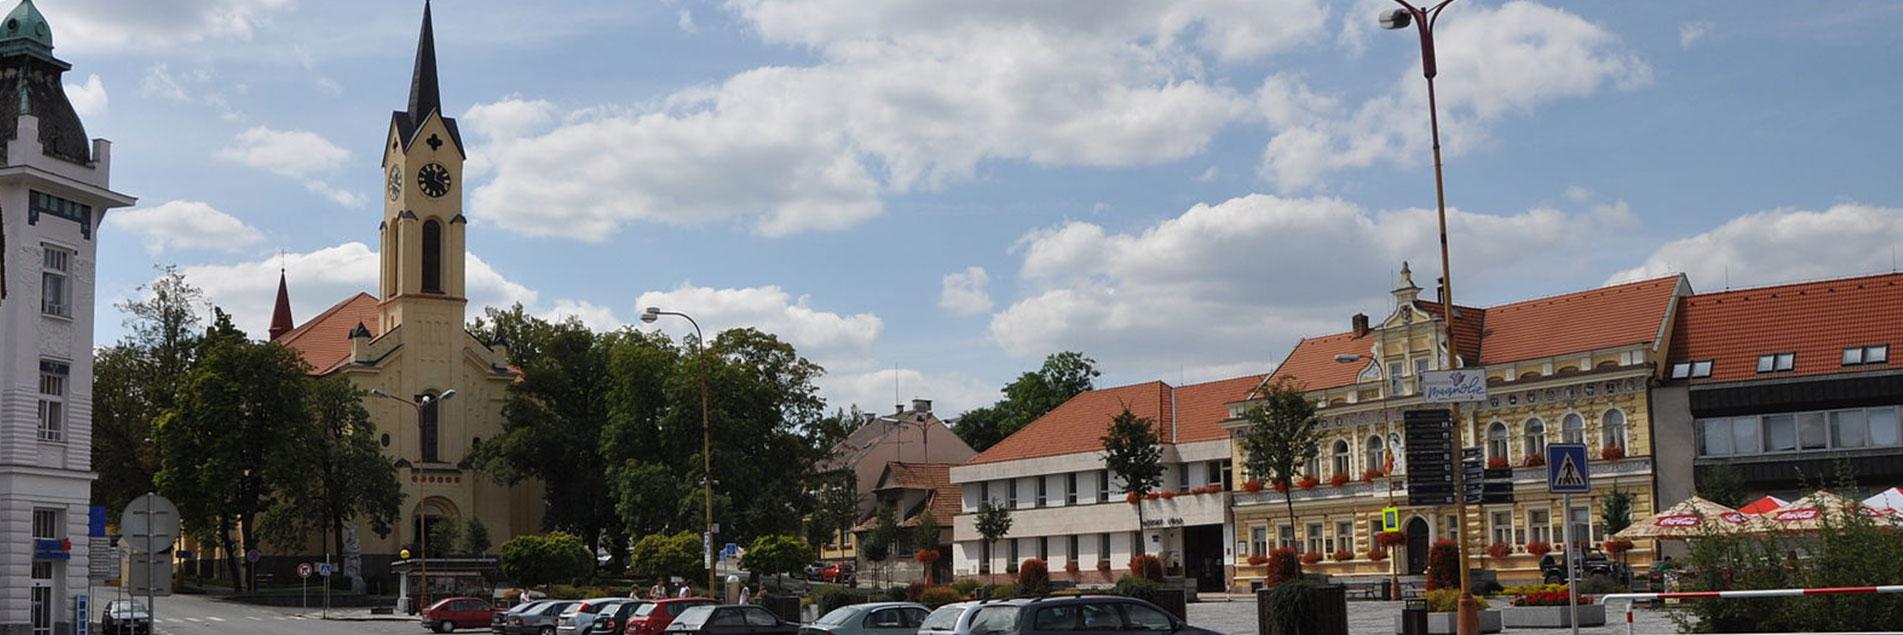 kostel Sv. Bartoloměje Milevsko